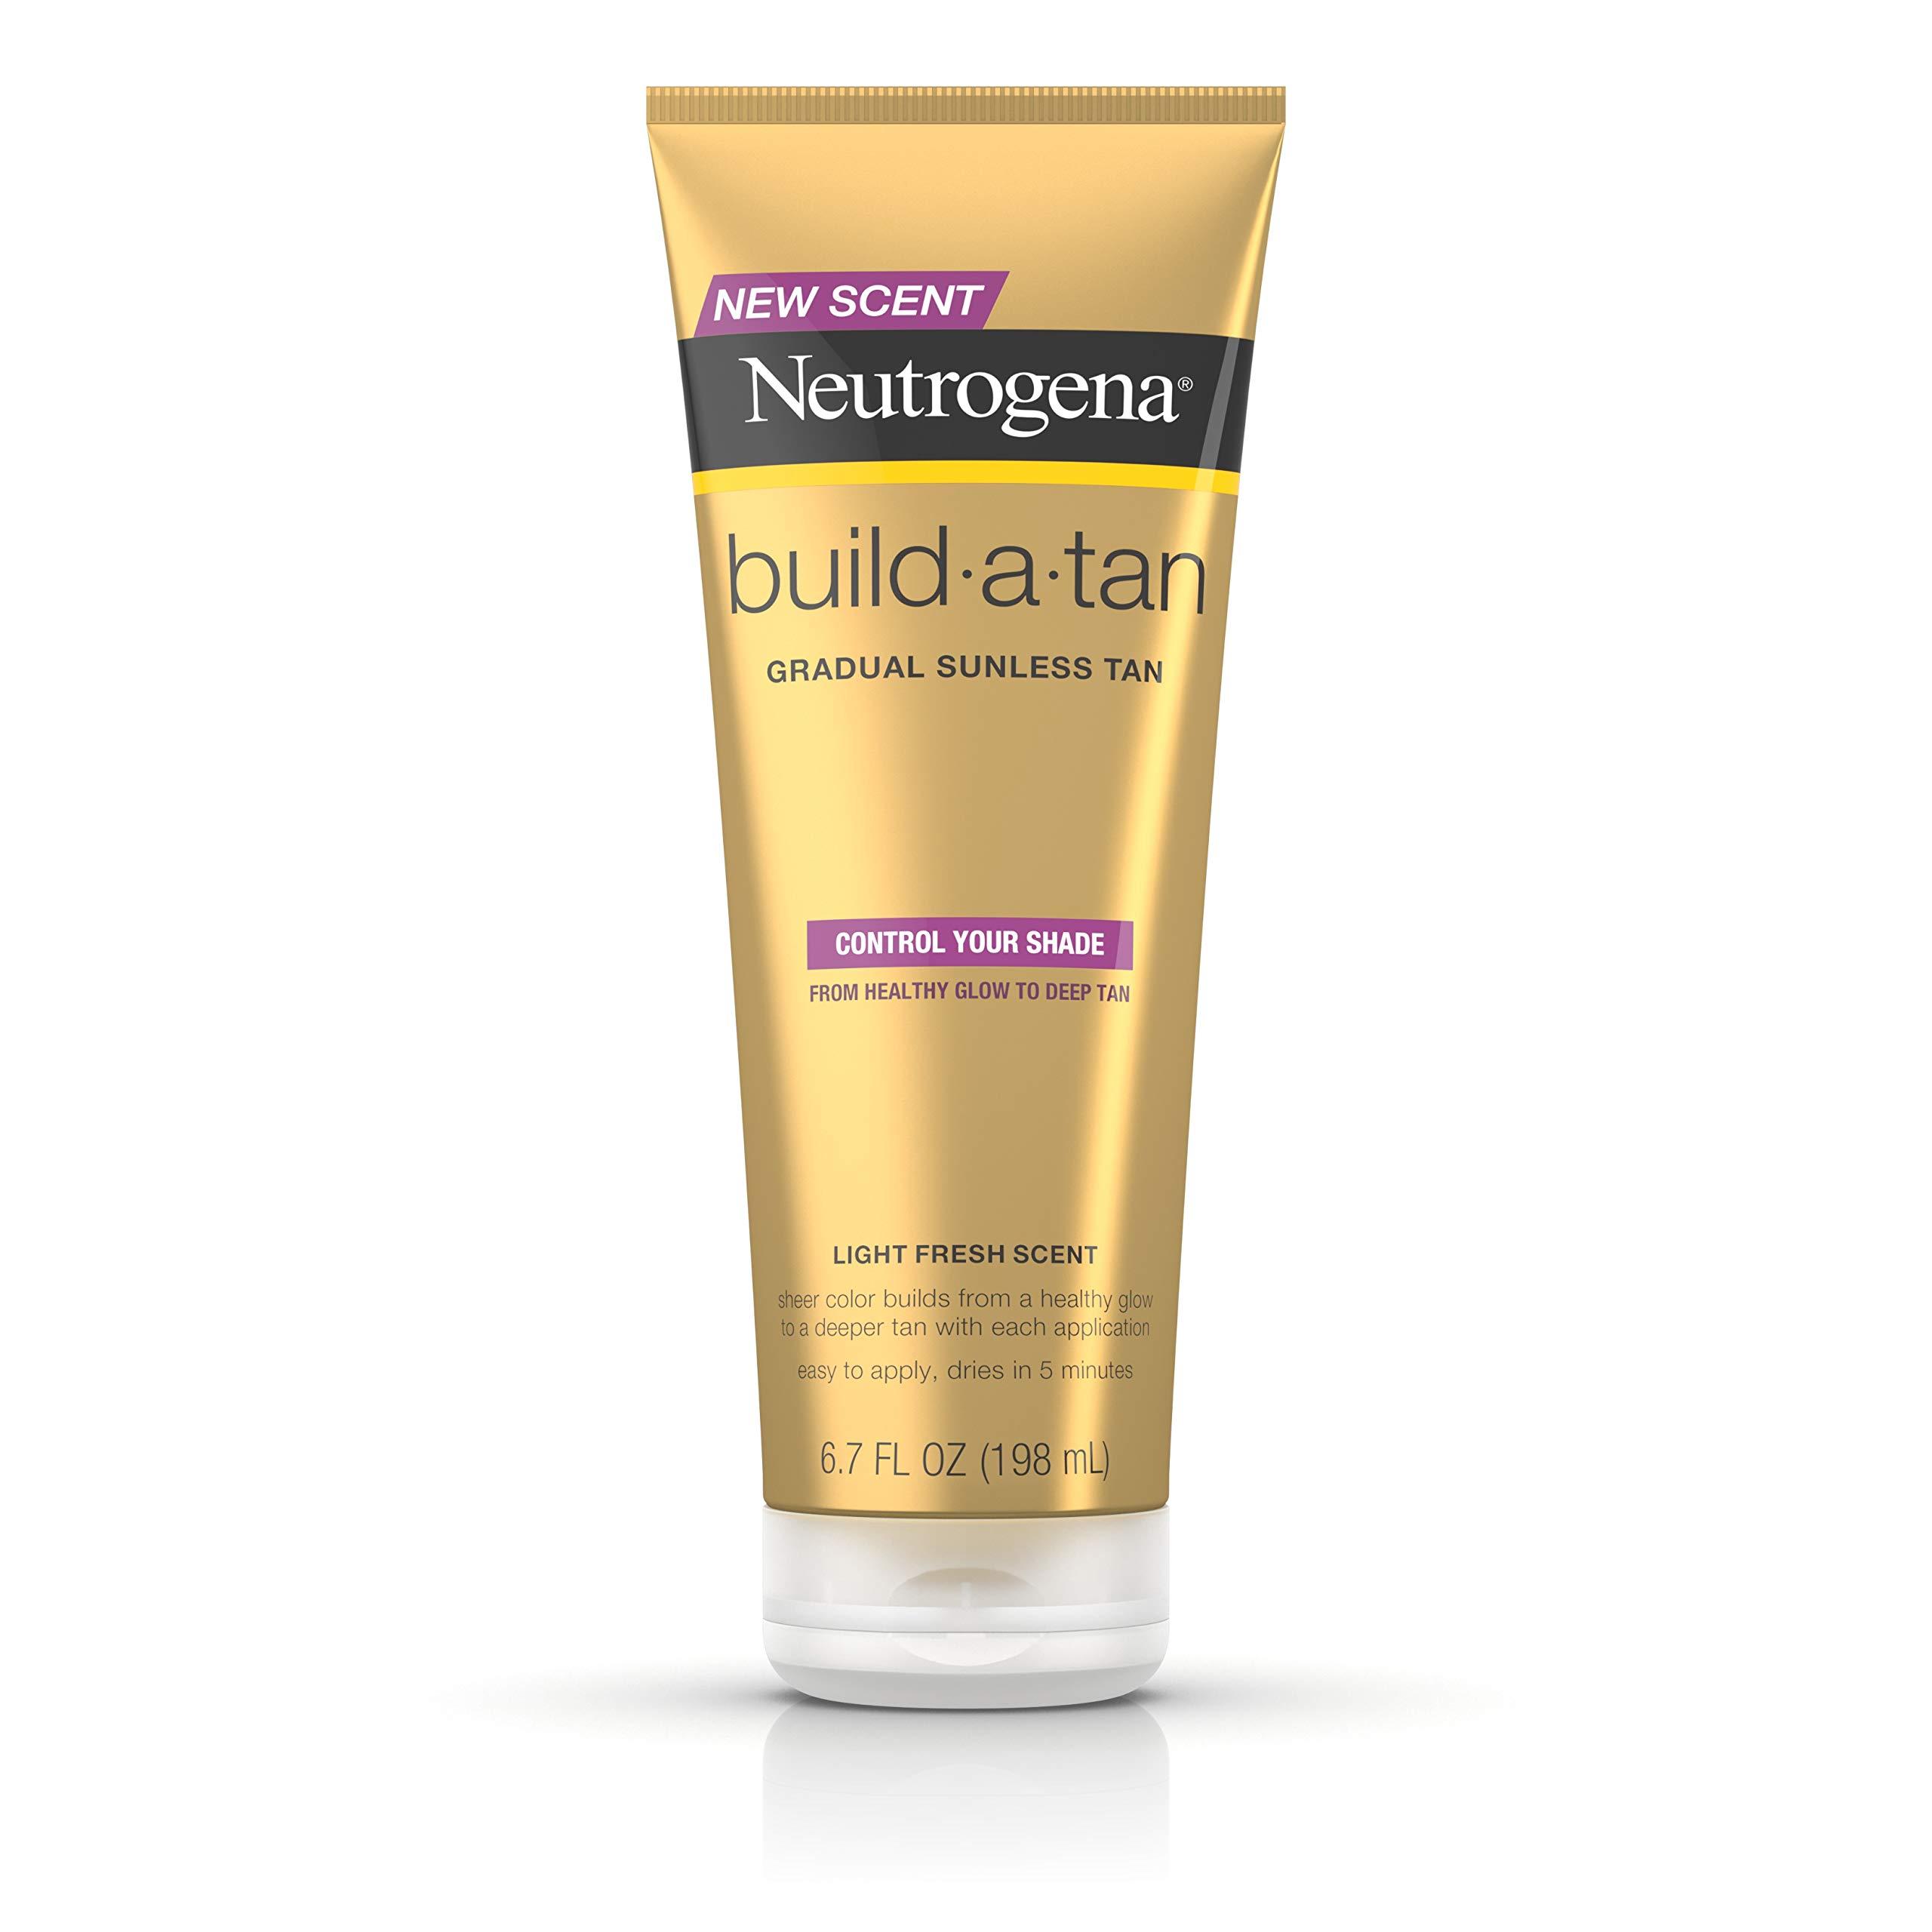 Neutrogena Build-A-Tan Gradual Sunless Tanning Lotion, Lightweight Self-Tanning Body Lotion for a Healthy Glow or Deep Tan, 6.7 fl. oz